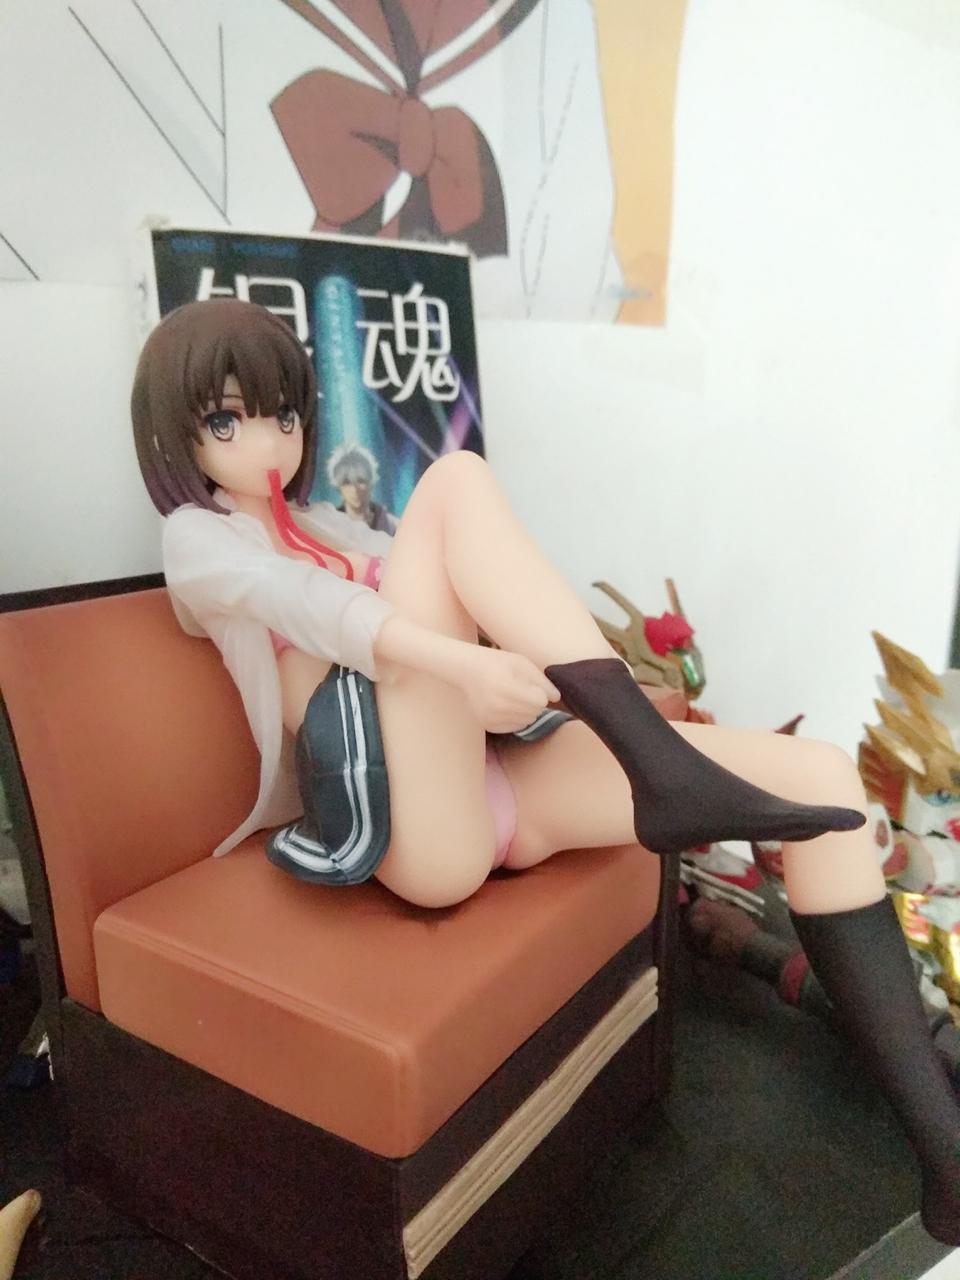 Saekano:How to Raise a Boring Girlfriend Megumi Kato Sofa Garage Kits Dolls Figure Statue-Garage Kit Dolls